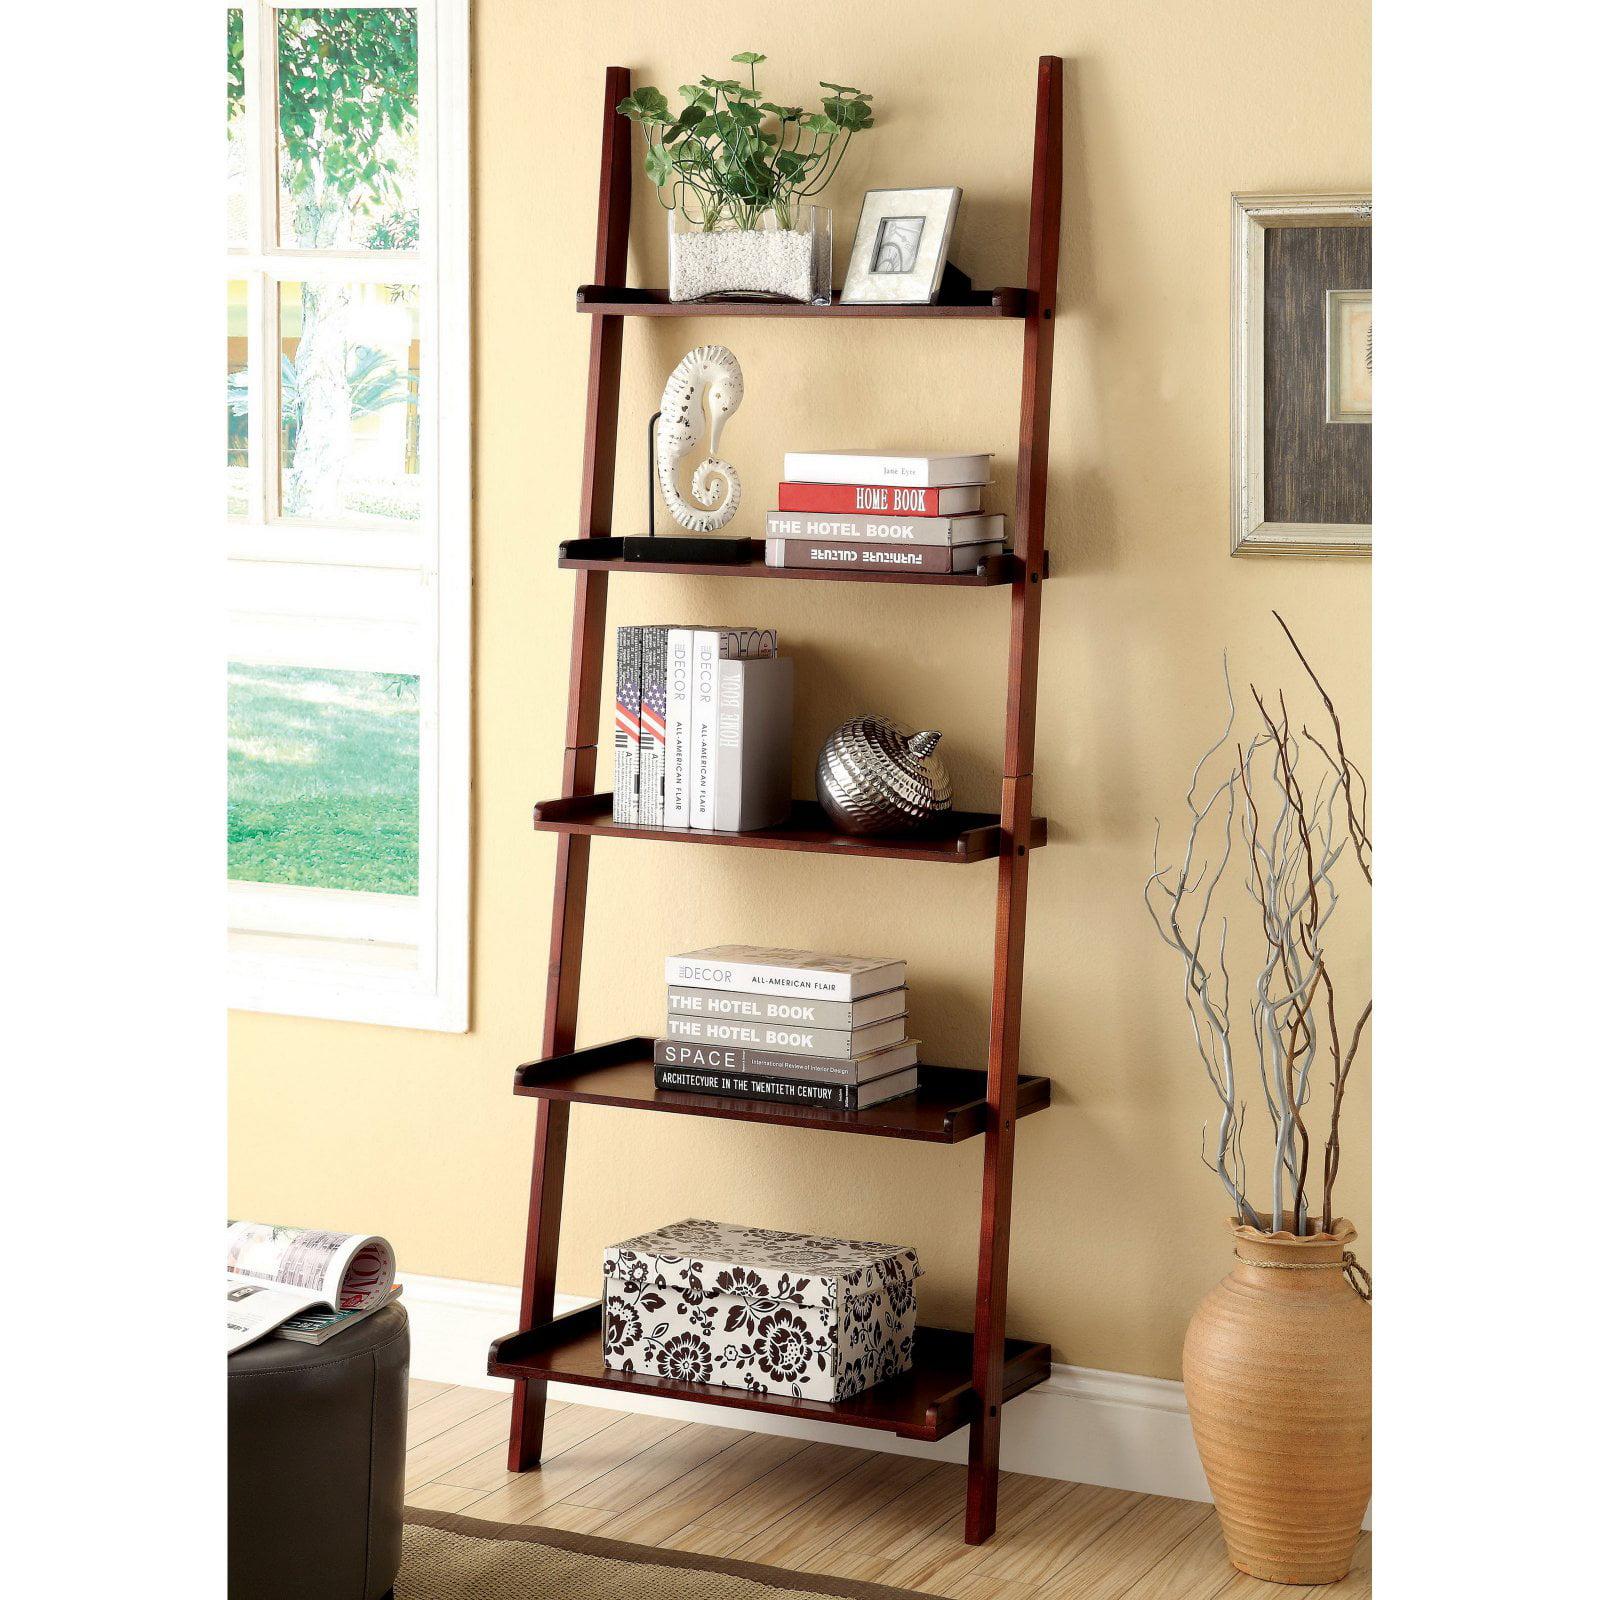 Furniture of America Delaris 5-Tier Ladder Shelf